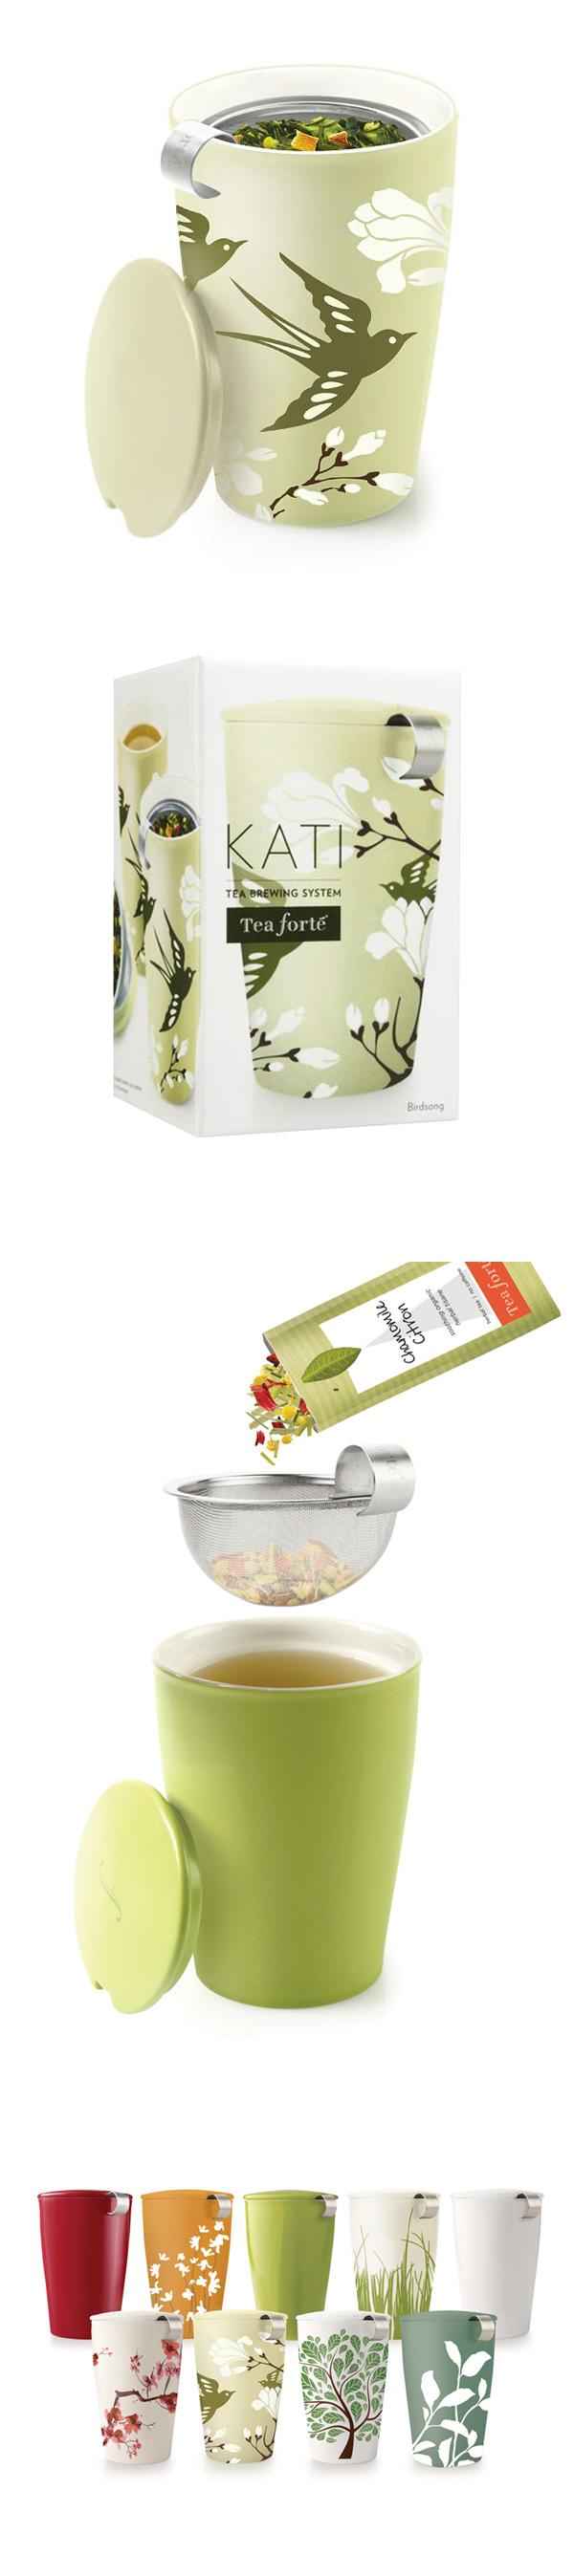 Tea Forte 卡緹茗茶杯 鳥語